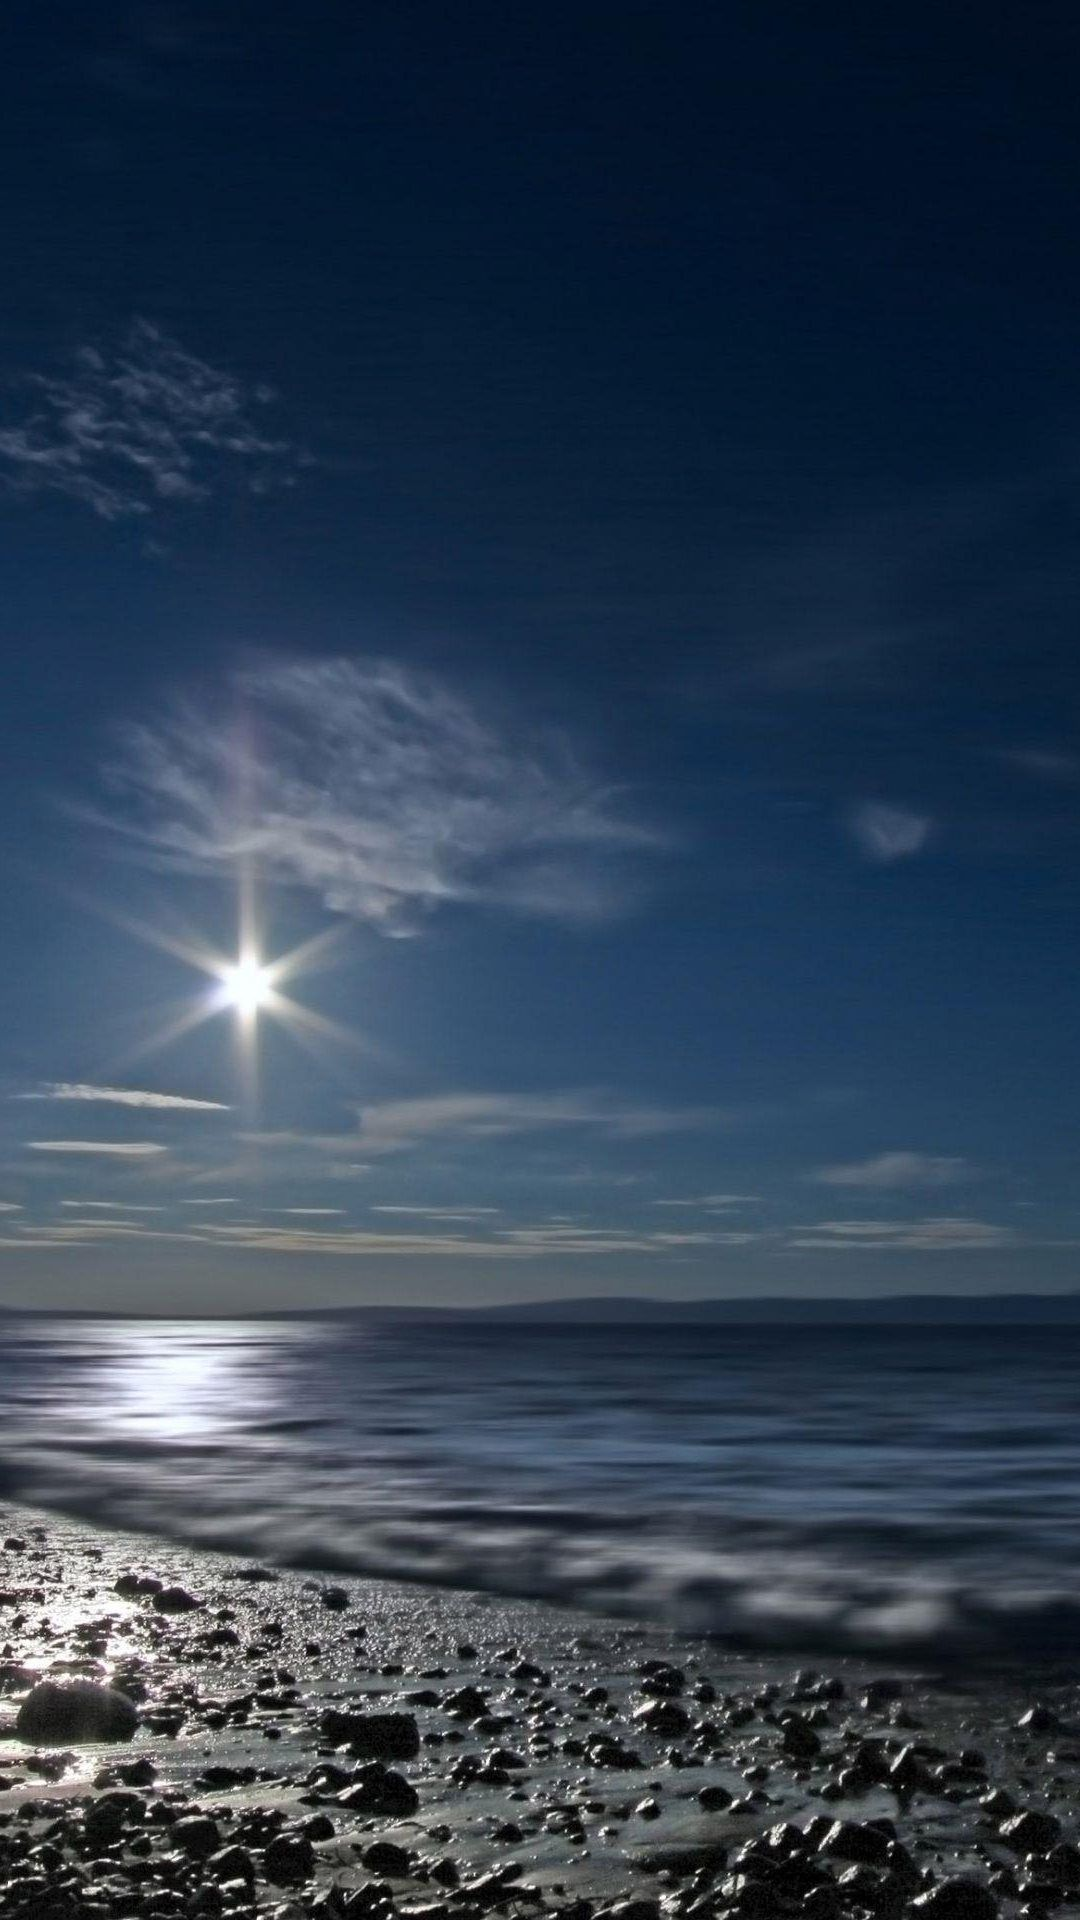 Shining Moon Over Sea iPhone 7 wallpaper Iphone 5s